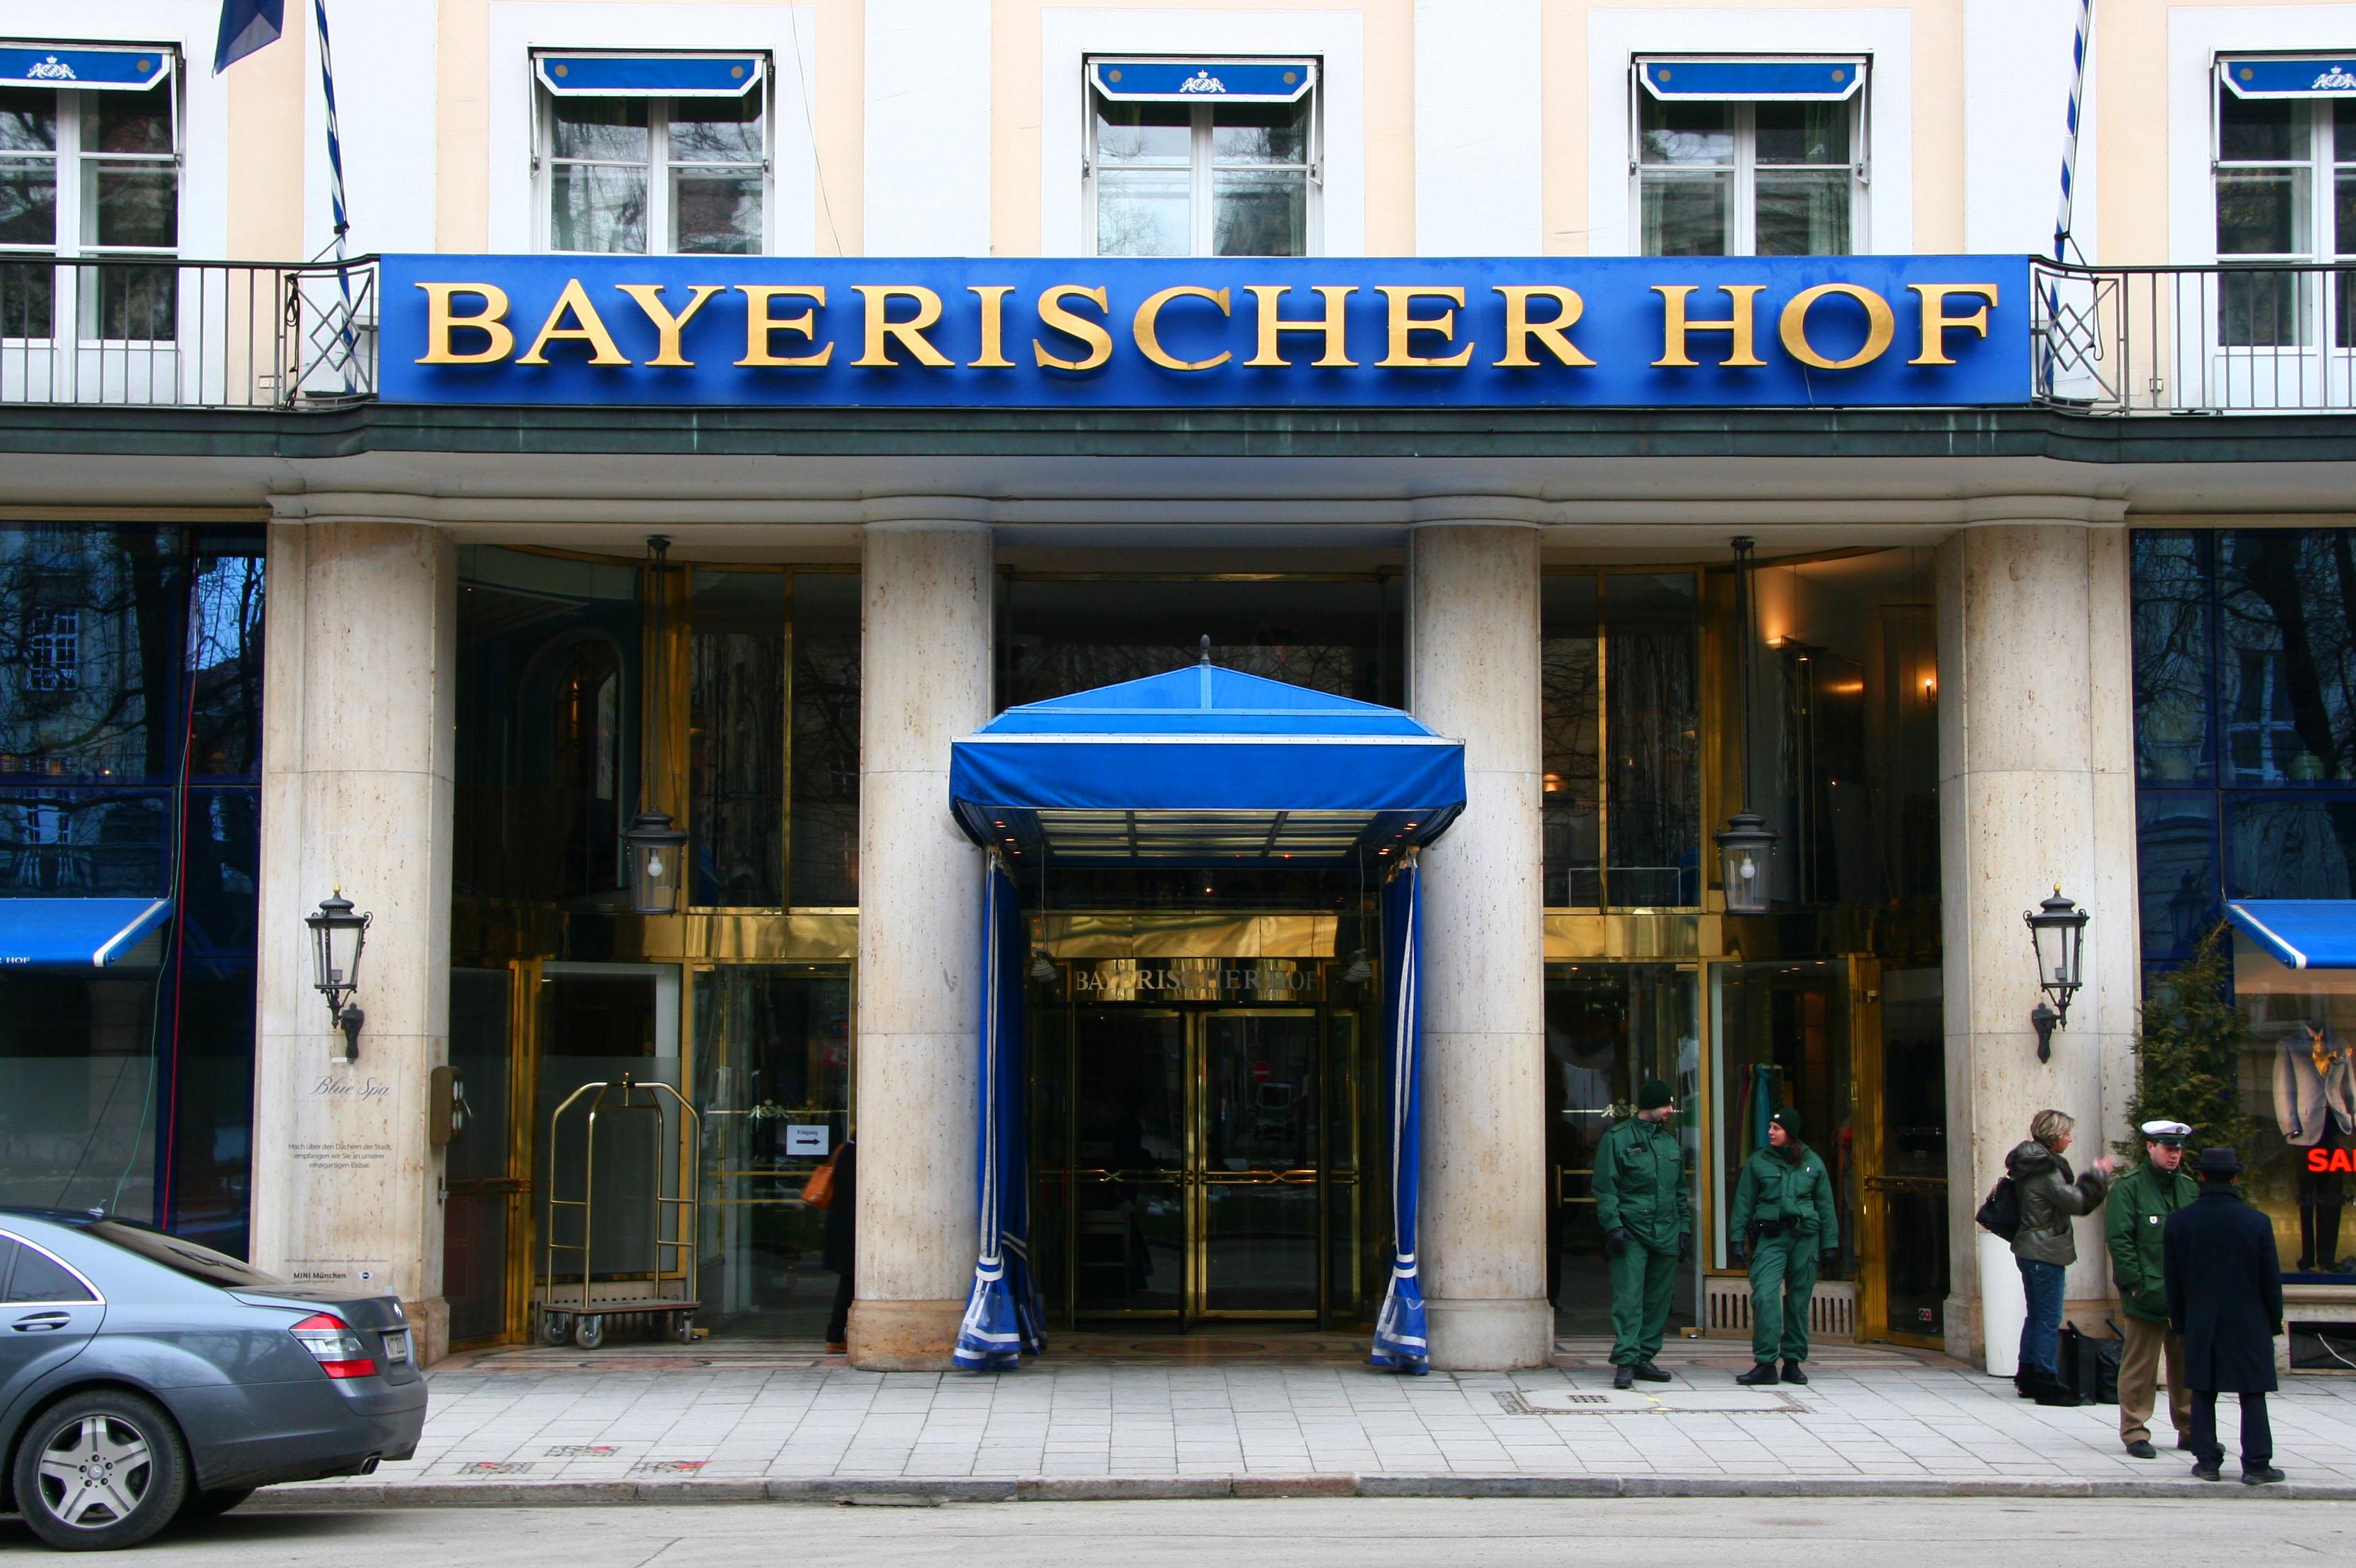 Hotel Bayerischer Hof Ingolstadt